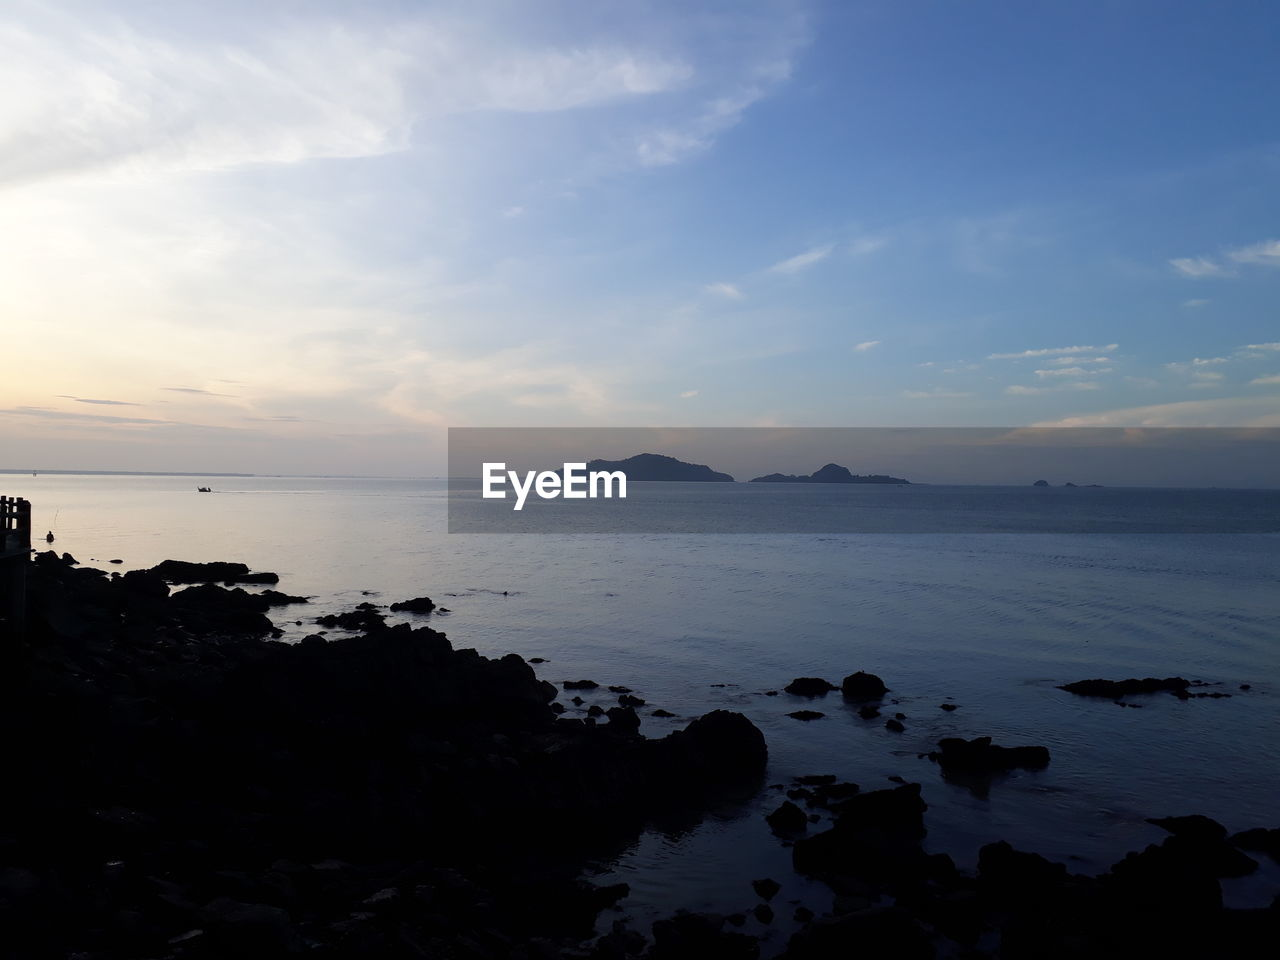 sky, water, scenics - nature, sea, tranquil scene, beauty in nature, tranquility, cloud - sky, sunset, land, idyllic, nature, horizon over water, beach, no people, horizon, non-urban scene, rock, outdoors